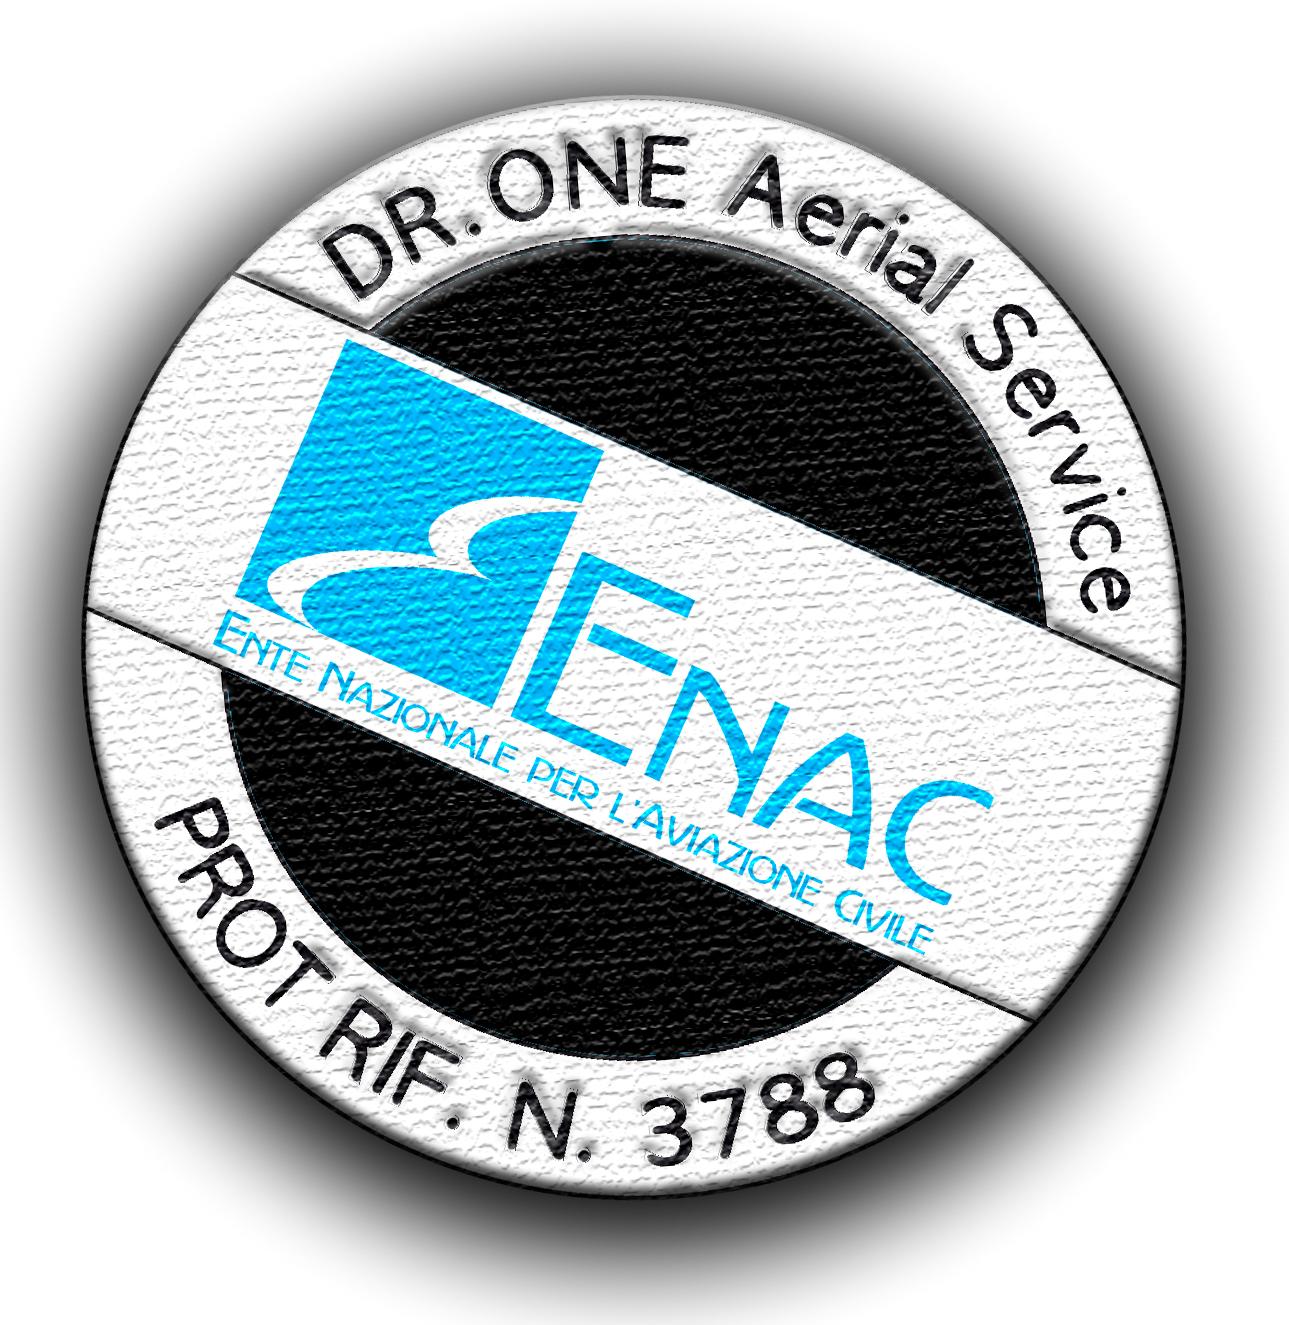 Enac dr.one brescia